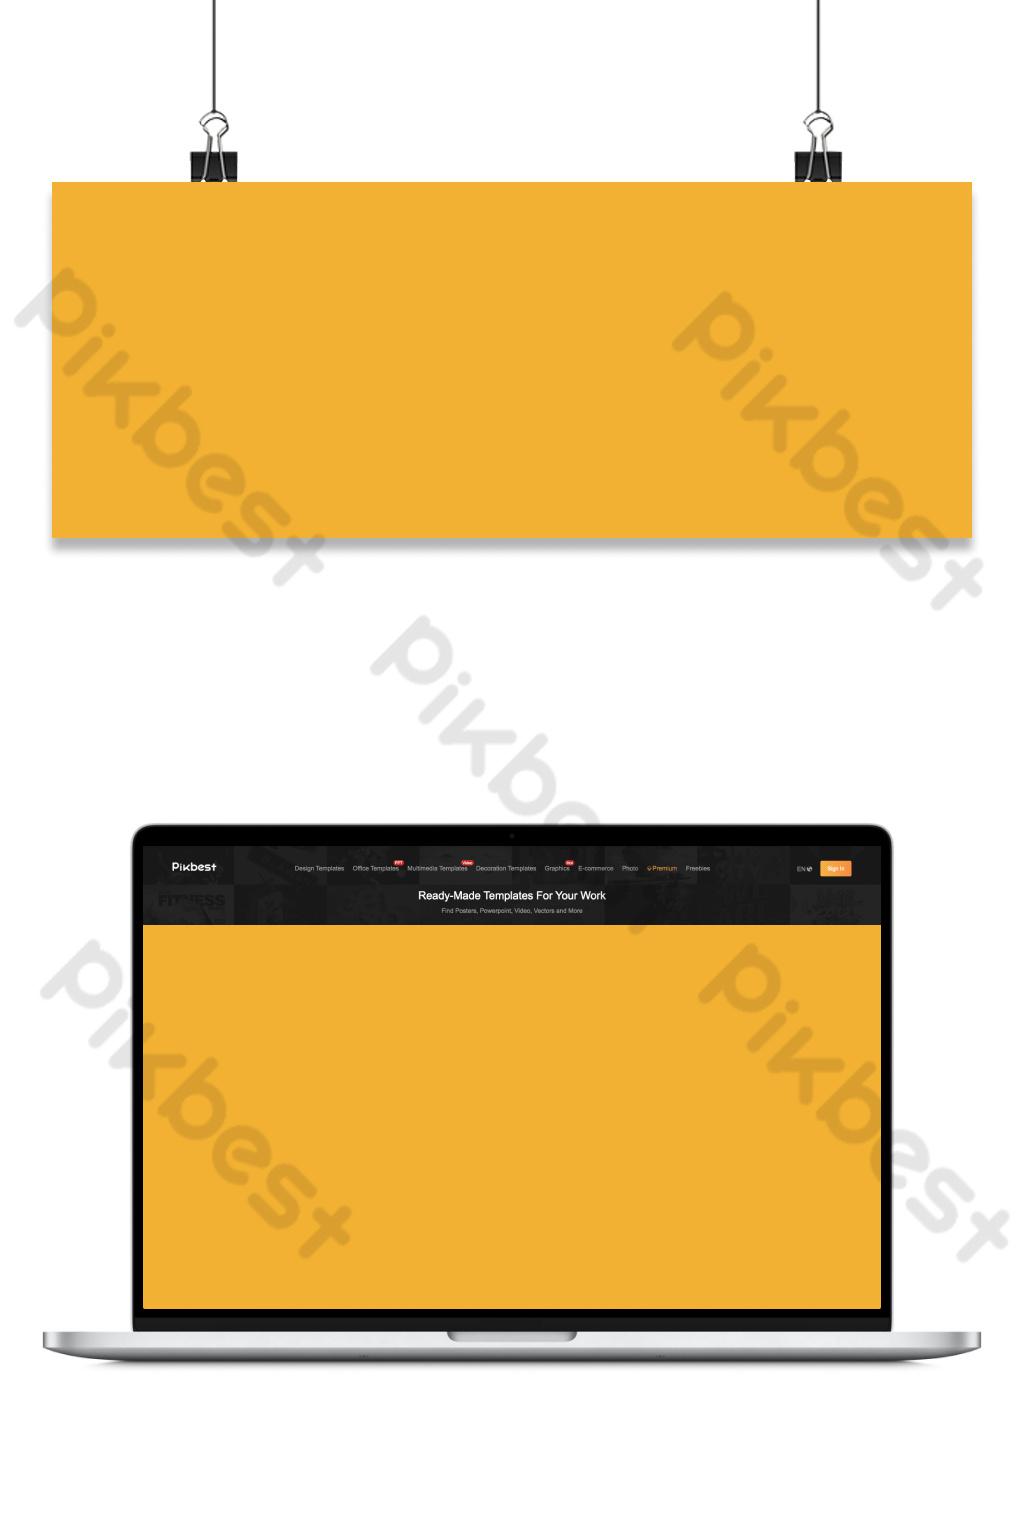 taobao emas hitam sederhana 818 banner promosi musim panas